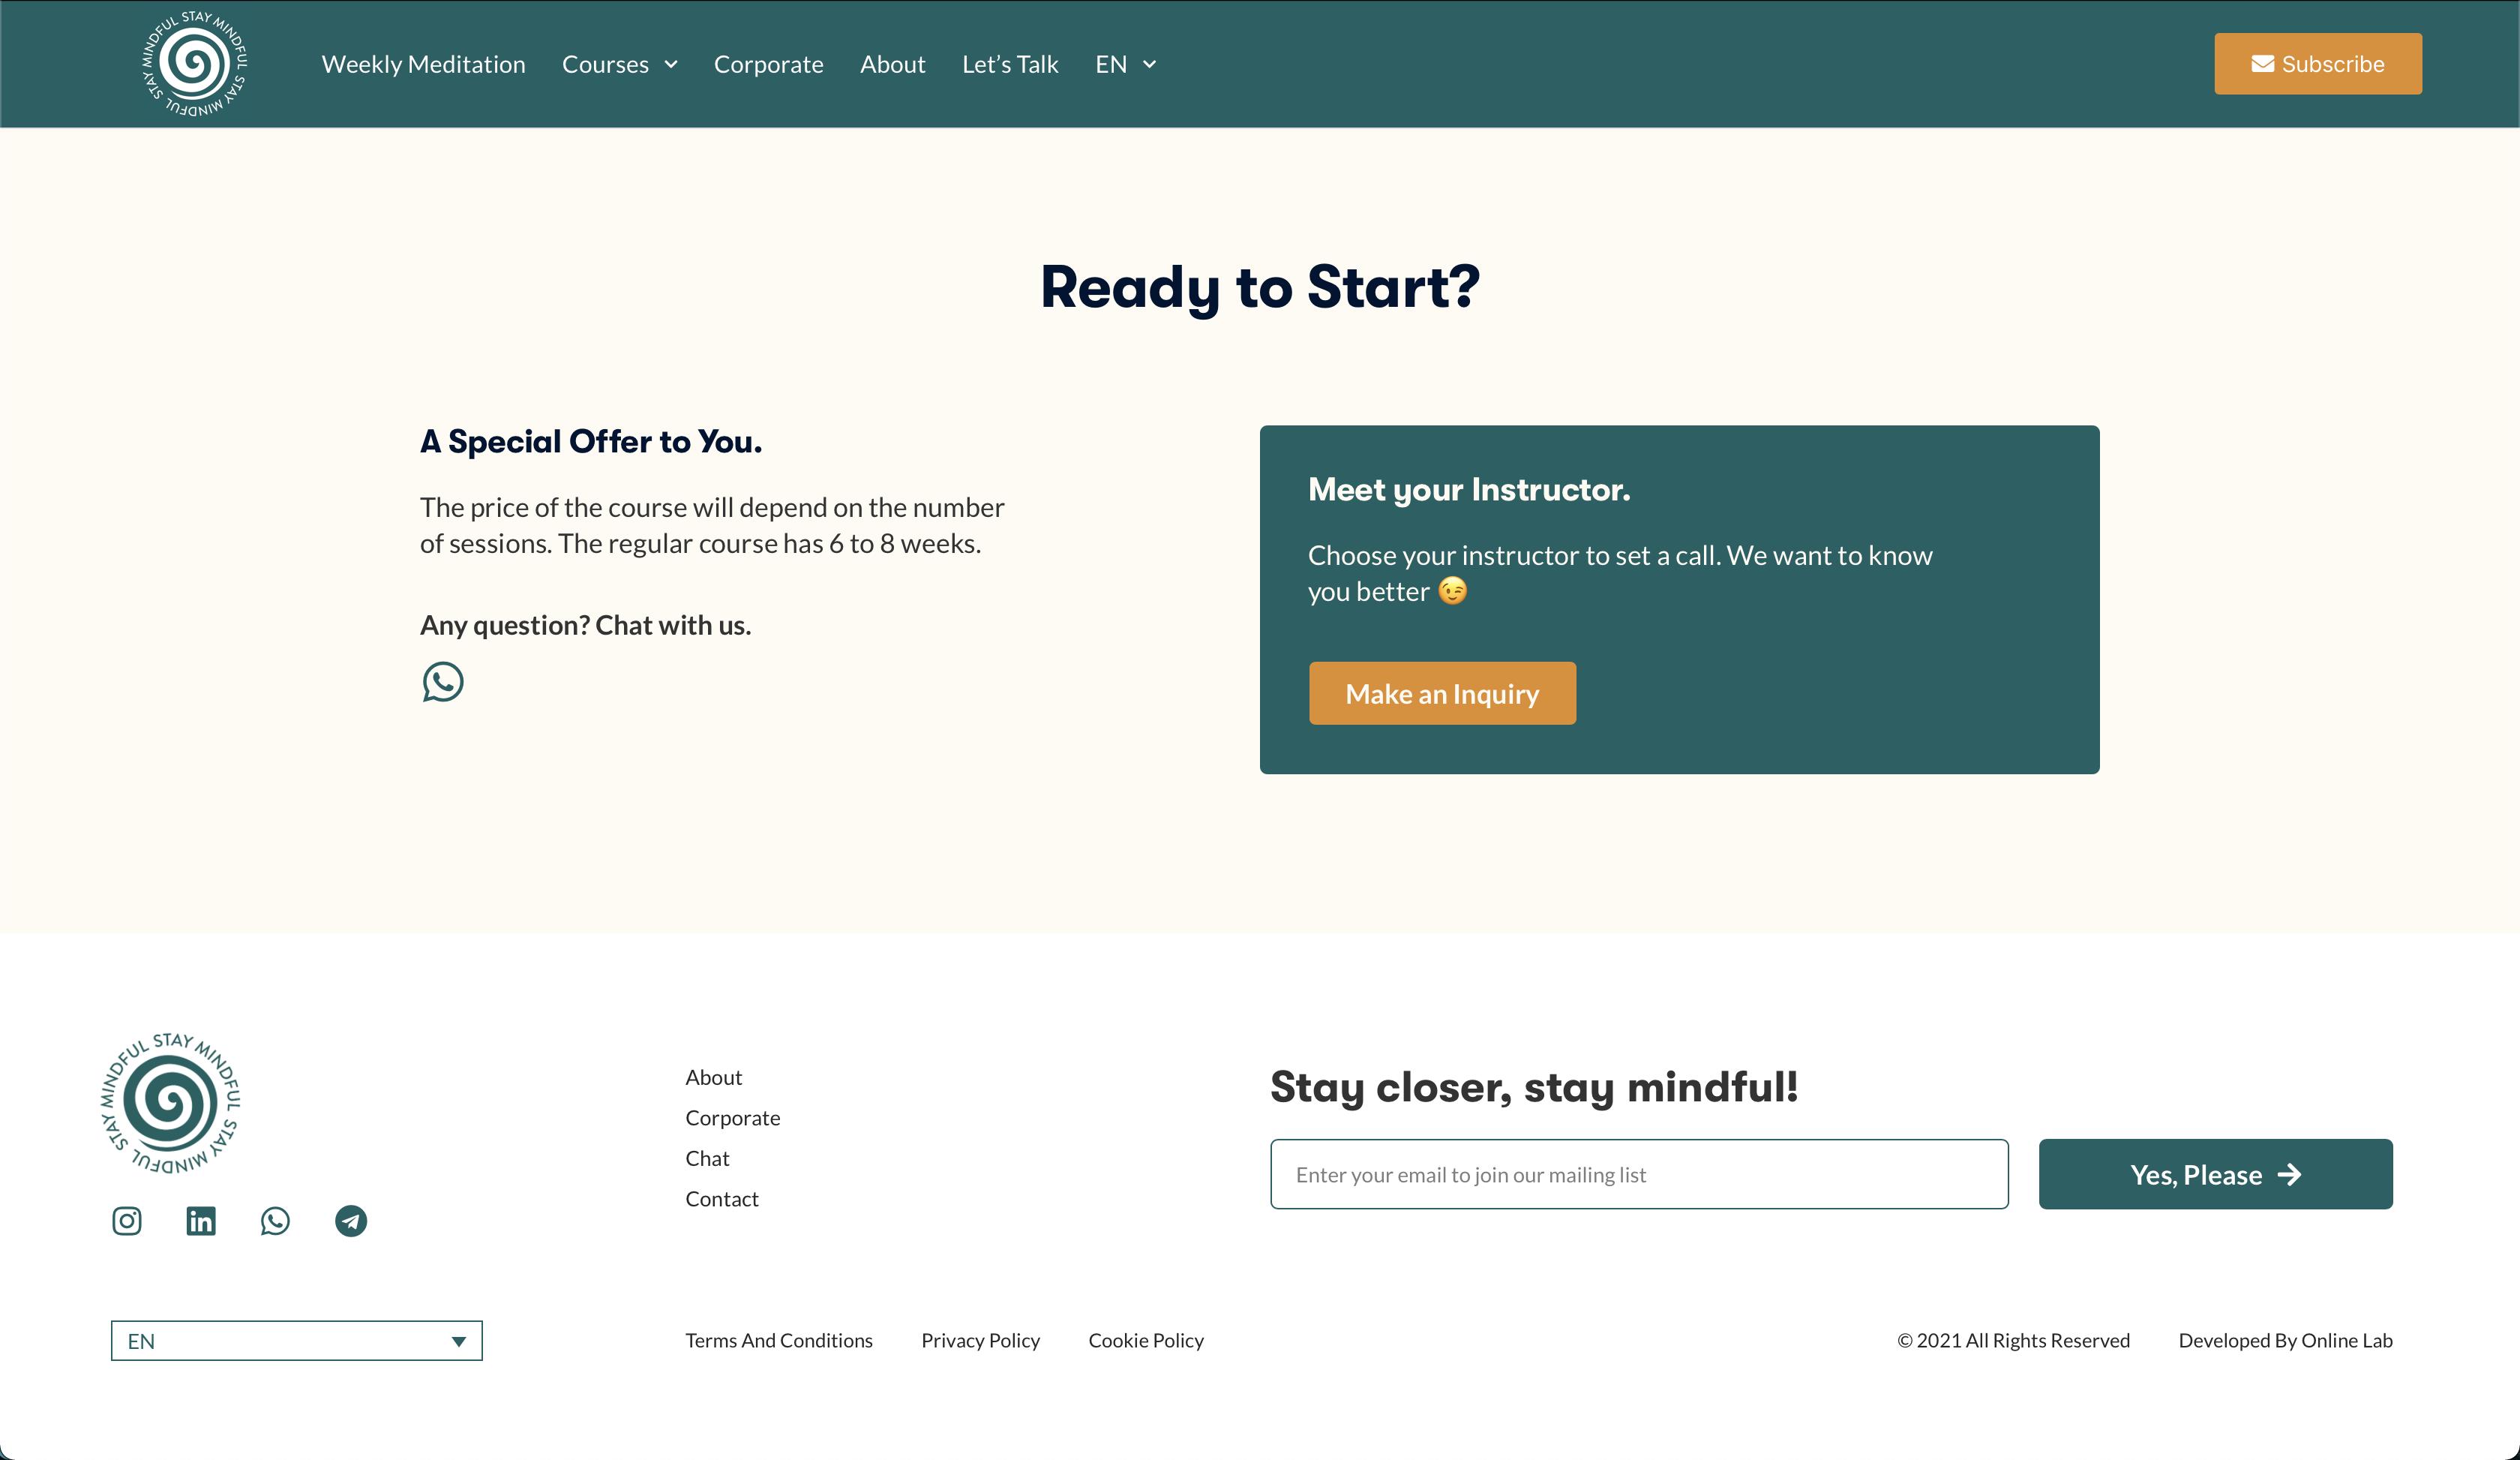 stay-mindful-online-lab-web-development-web-design-8